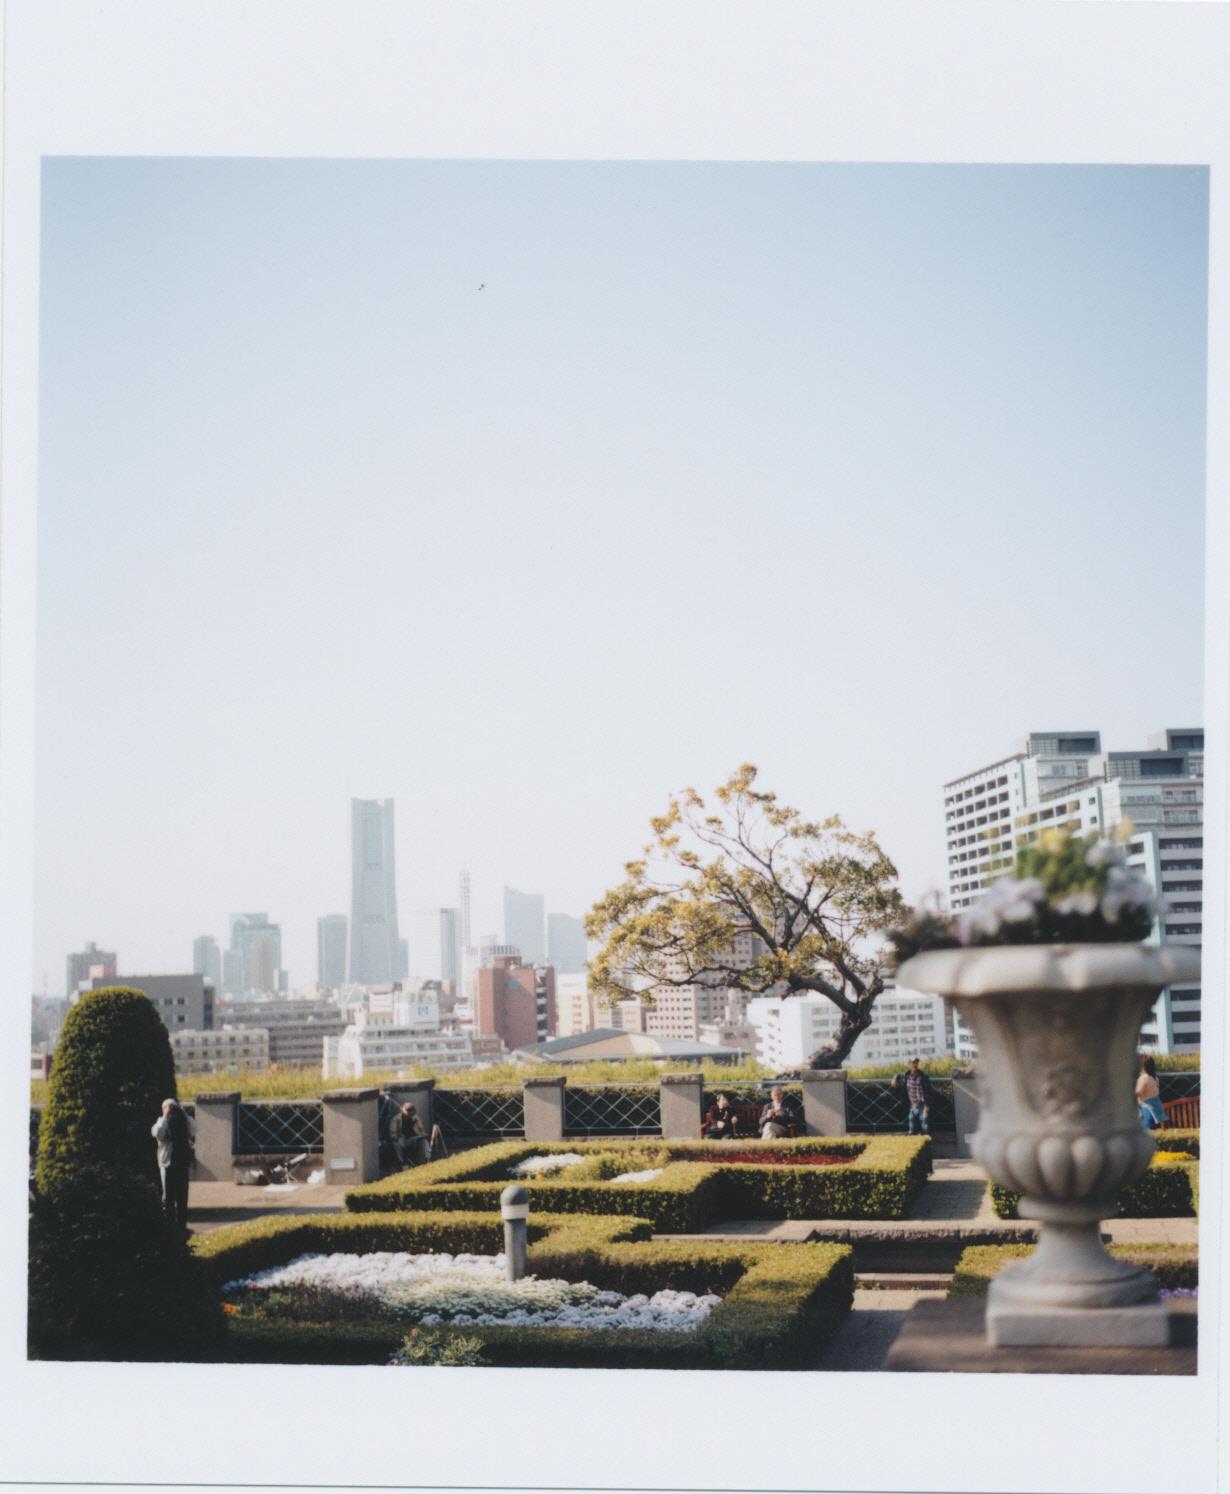 Kodak_PORTRA_160NC_0011